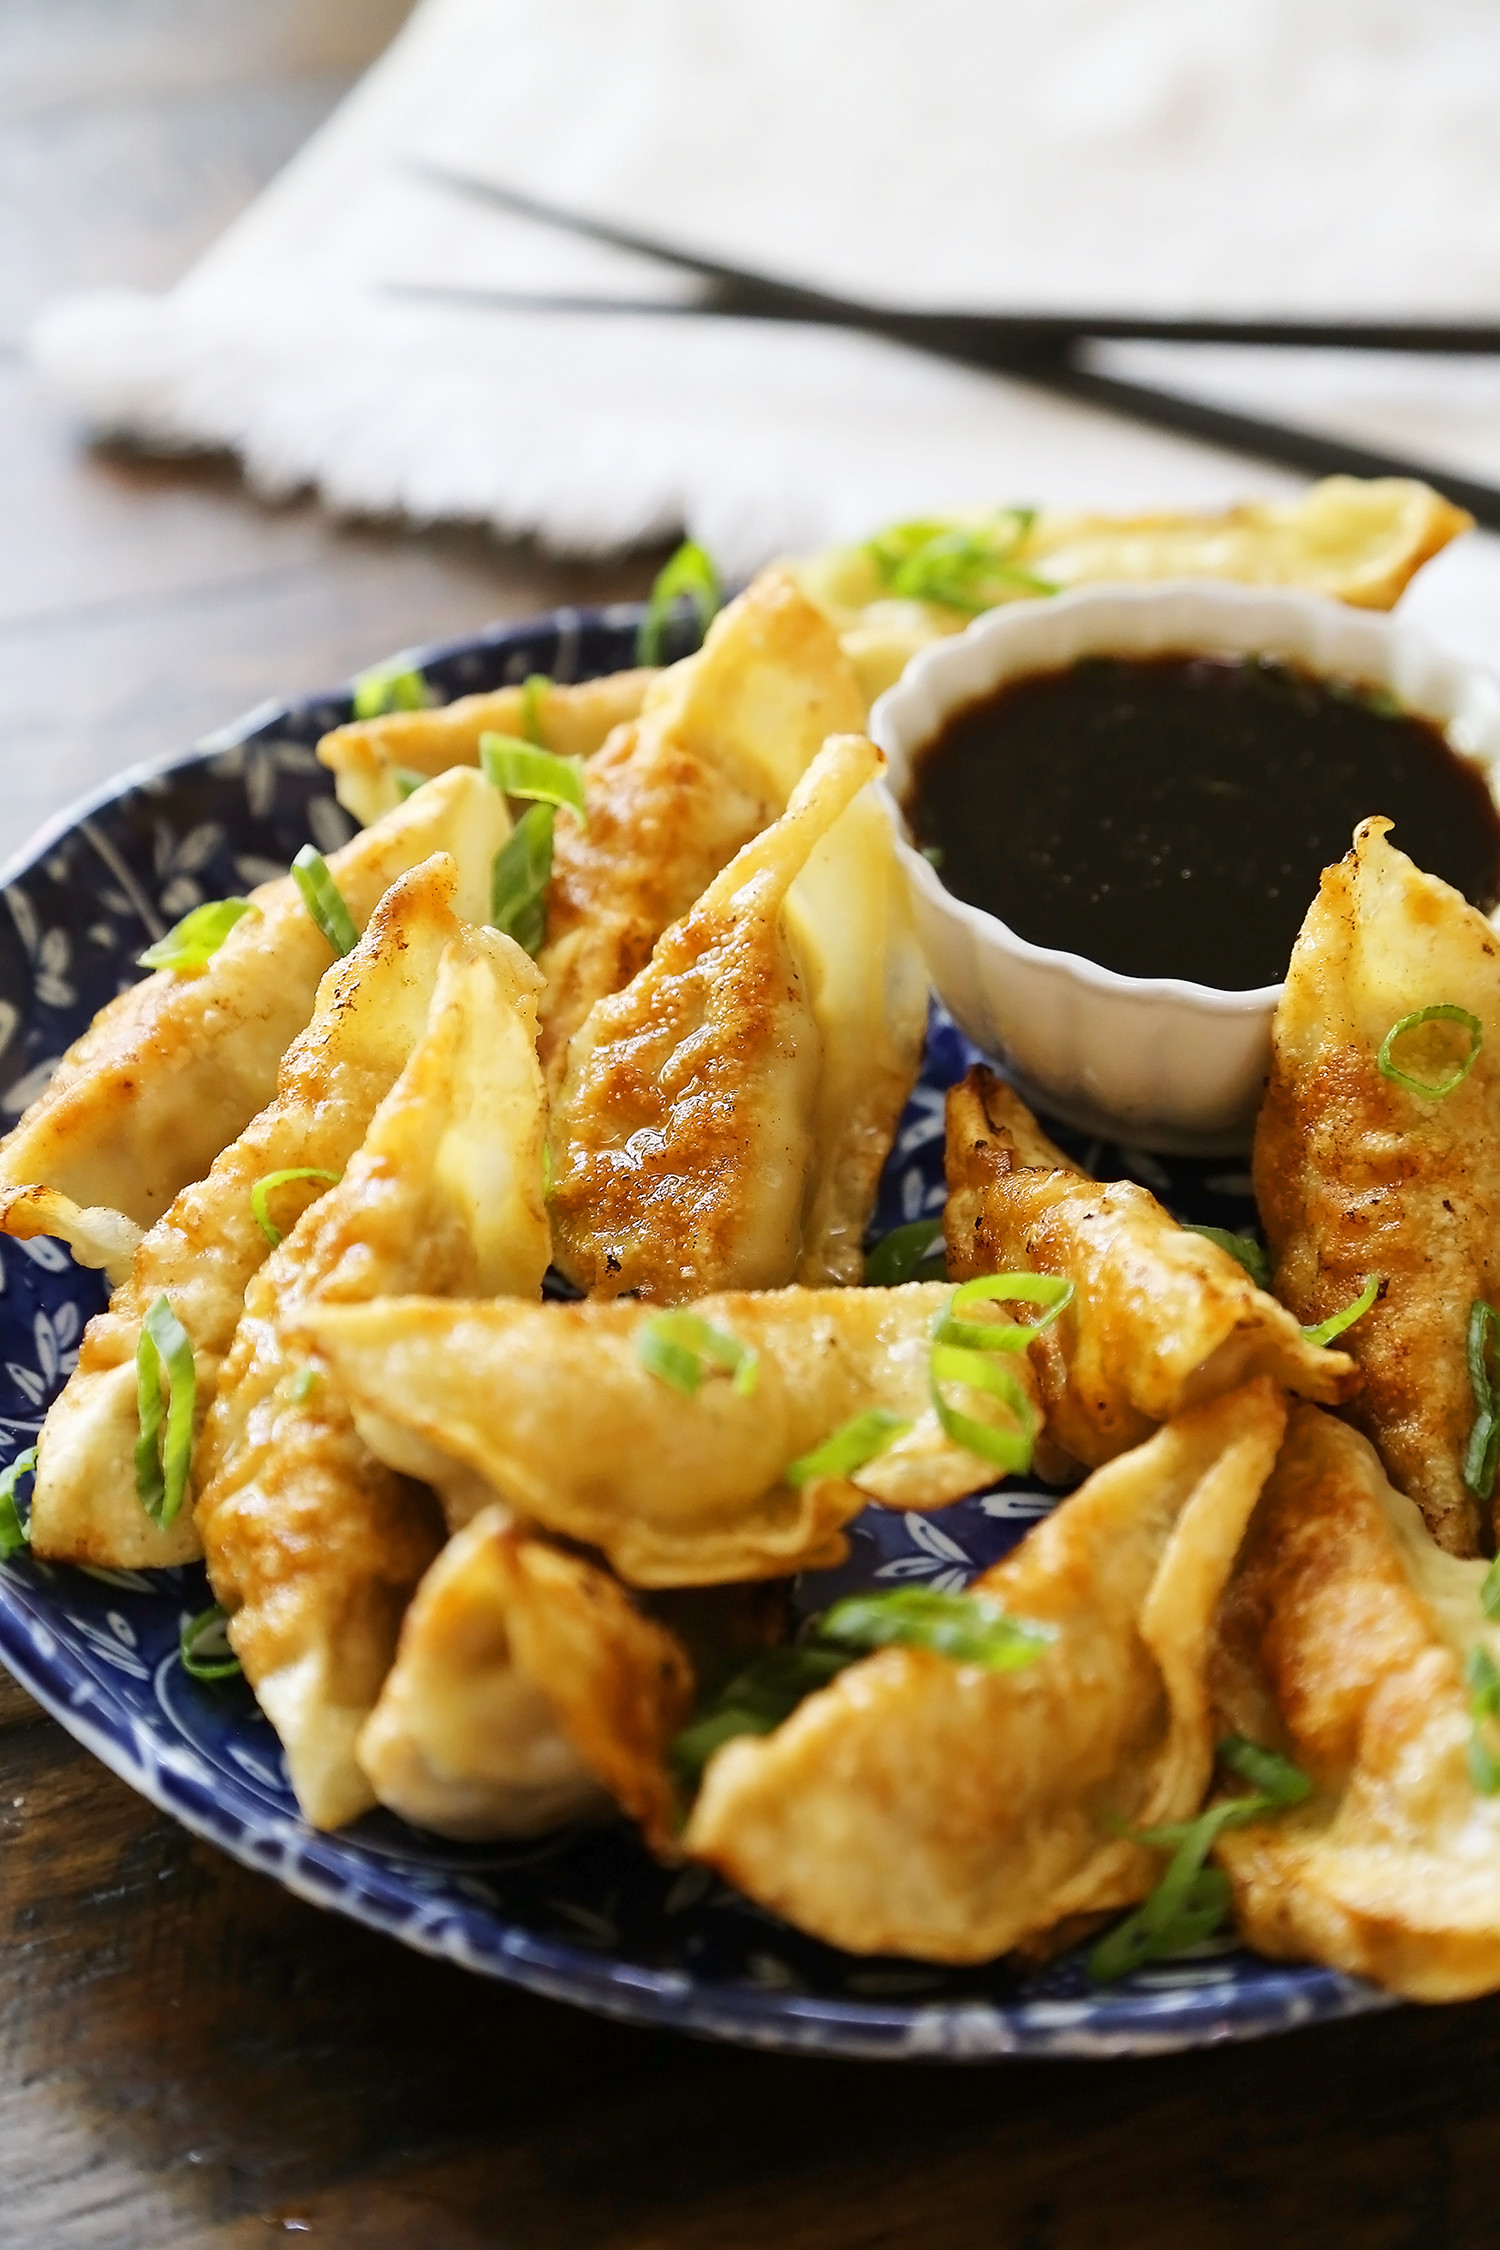 Sauce For Dumplings  Easy Asian Dumplings with Soy Ginger Dipping Sauce